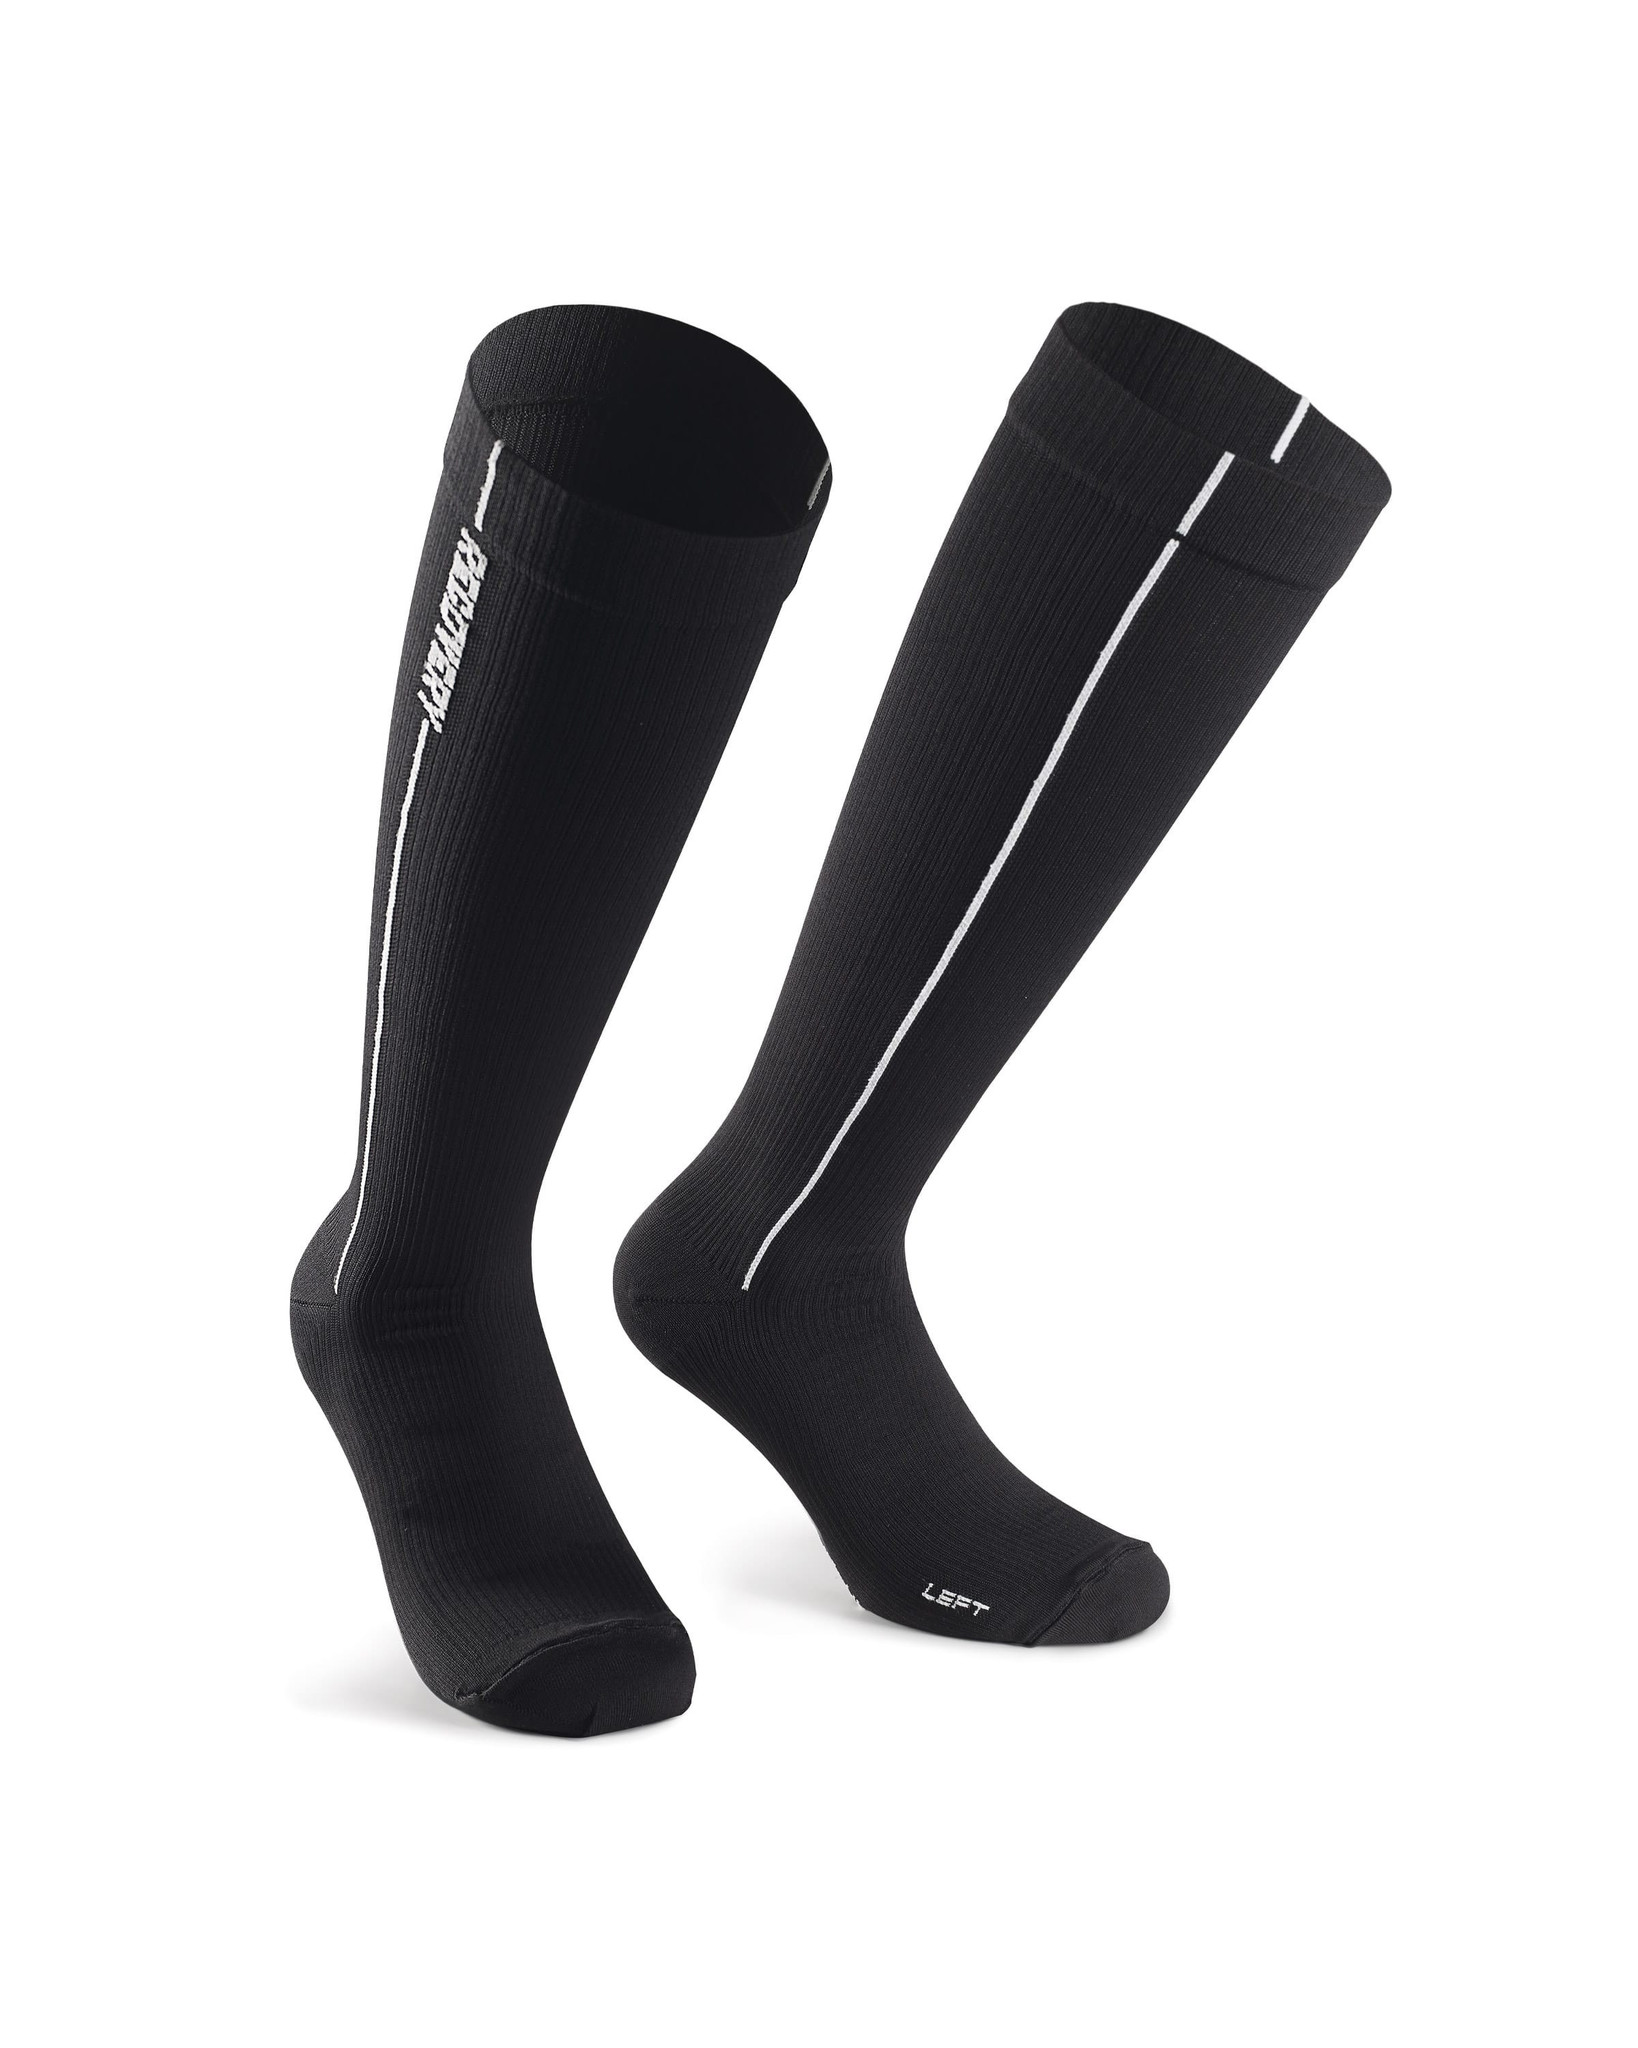 Assos Assos Recovery Socks - Compressie sokken